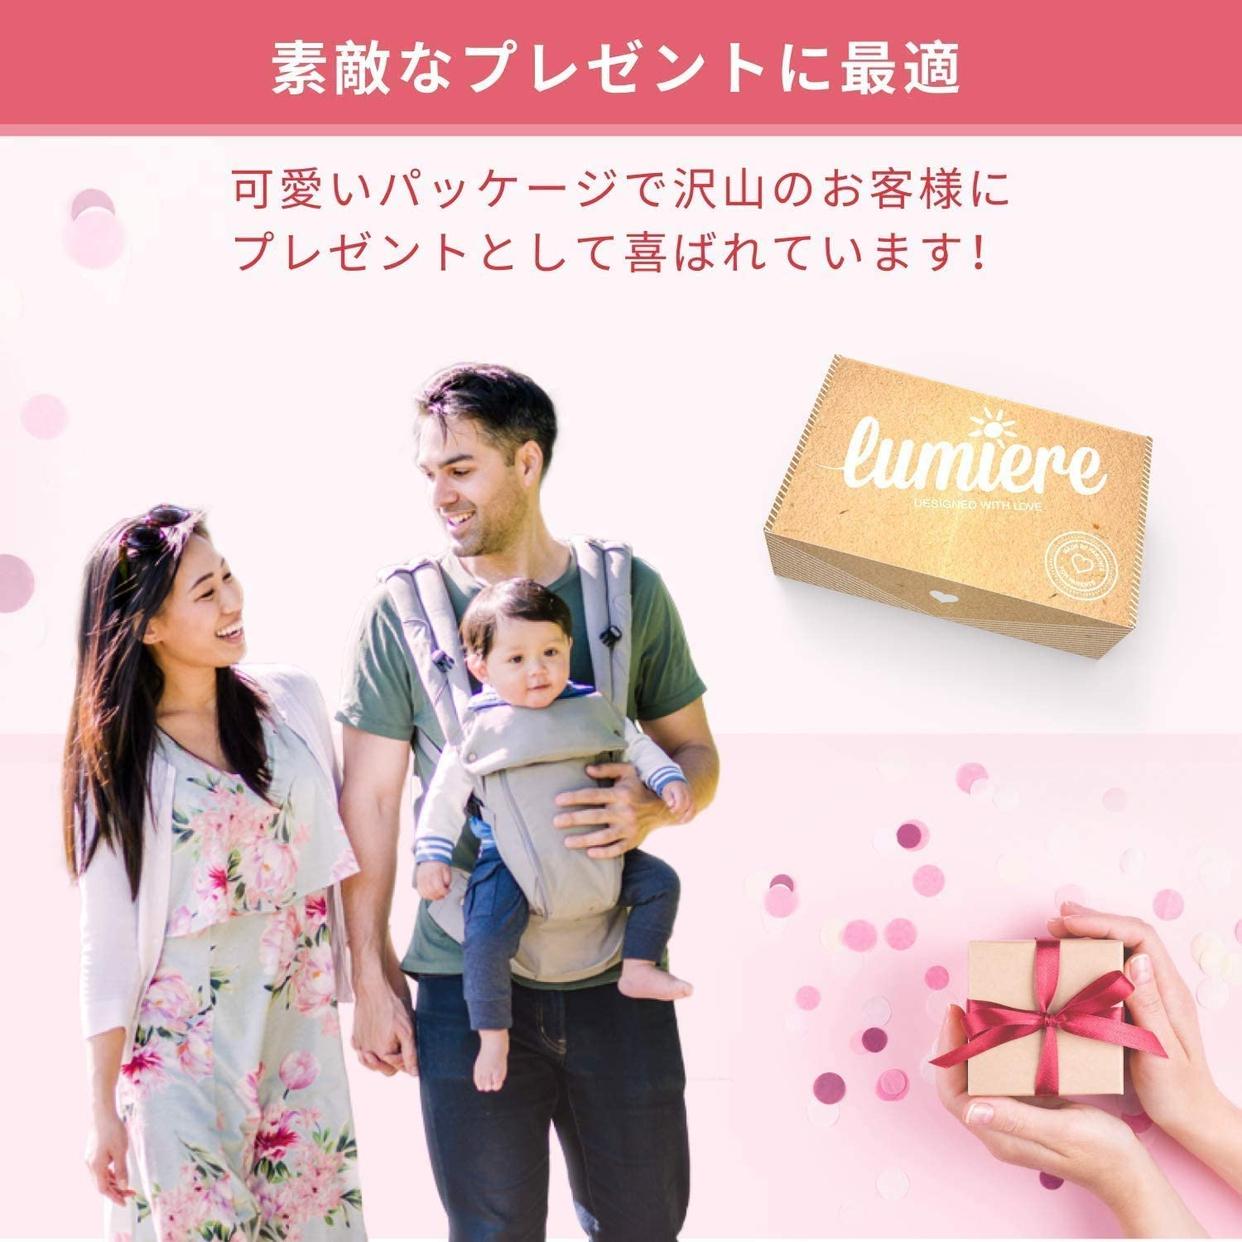 Lumiere(ルミエール) 6WAY 抱っこ紐の商品画像6